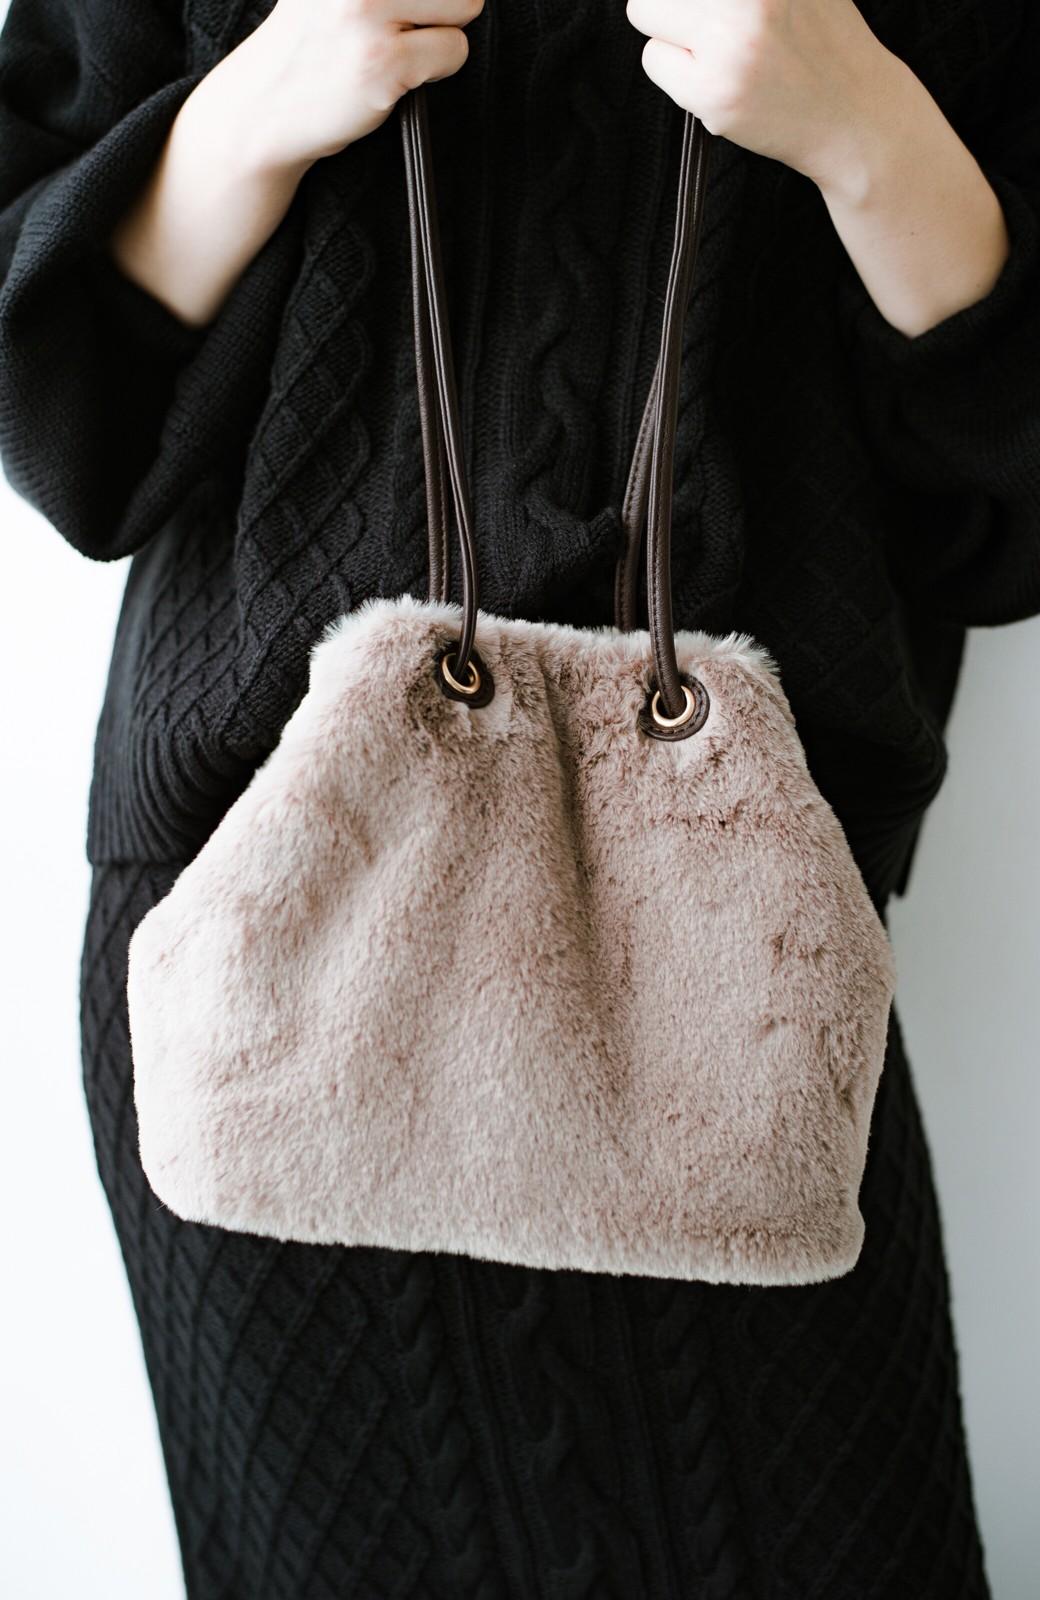 haco! さっと持って気分が上がる ふわっとかわいいエコファー巾着バッグ <グレイッシュベージュ>の商品写真5